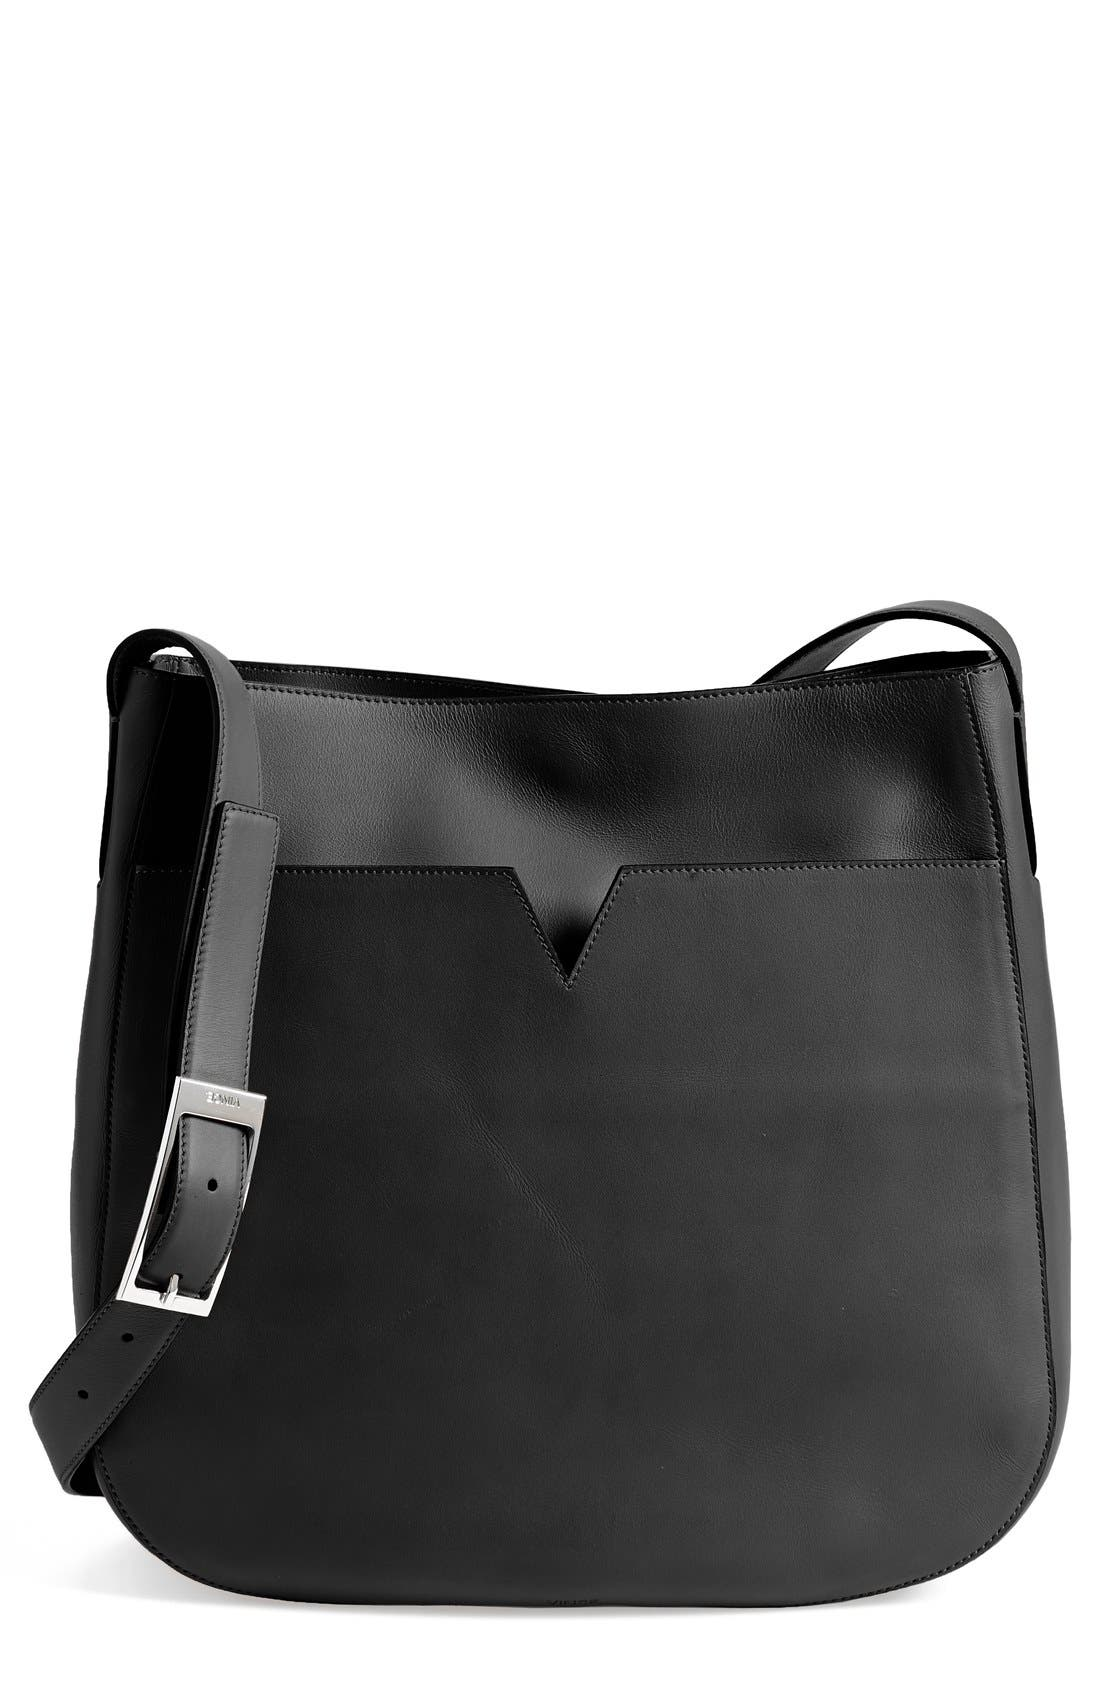 VINCE 'Medium' Leather Crossbody Bag, Main, color, 001